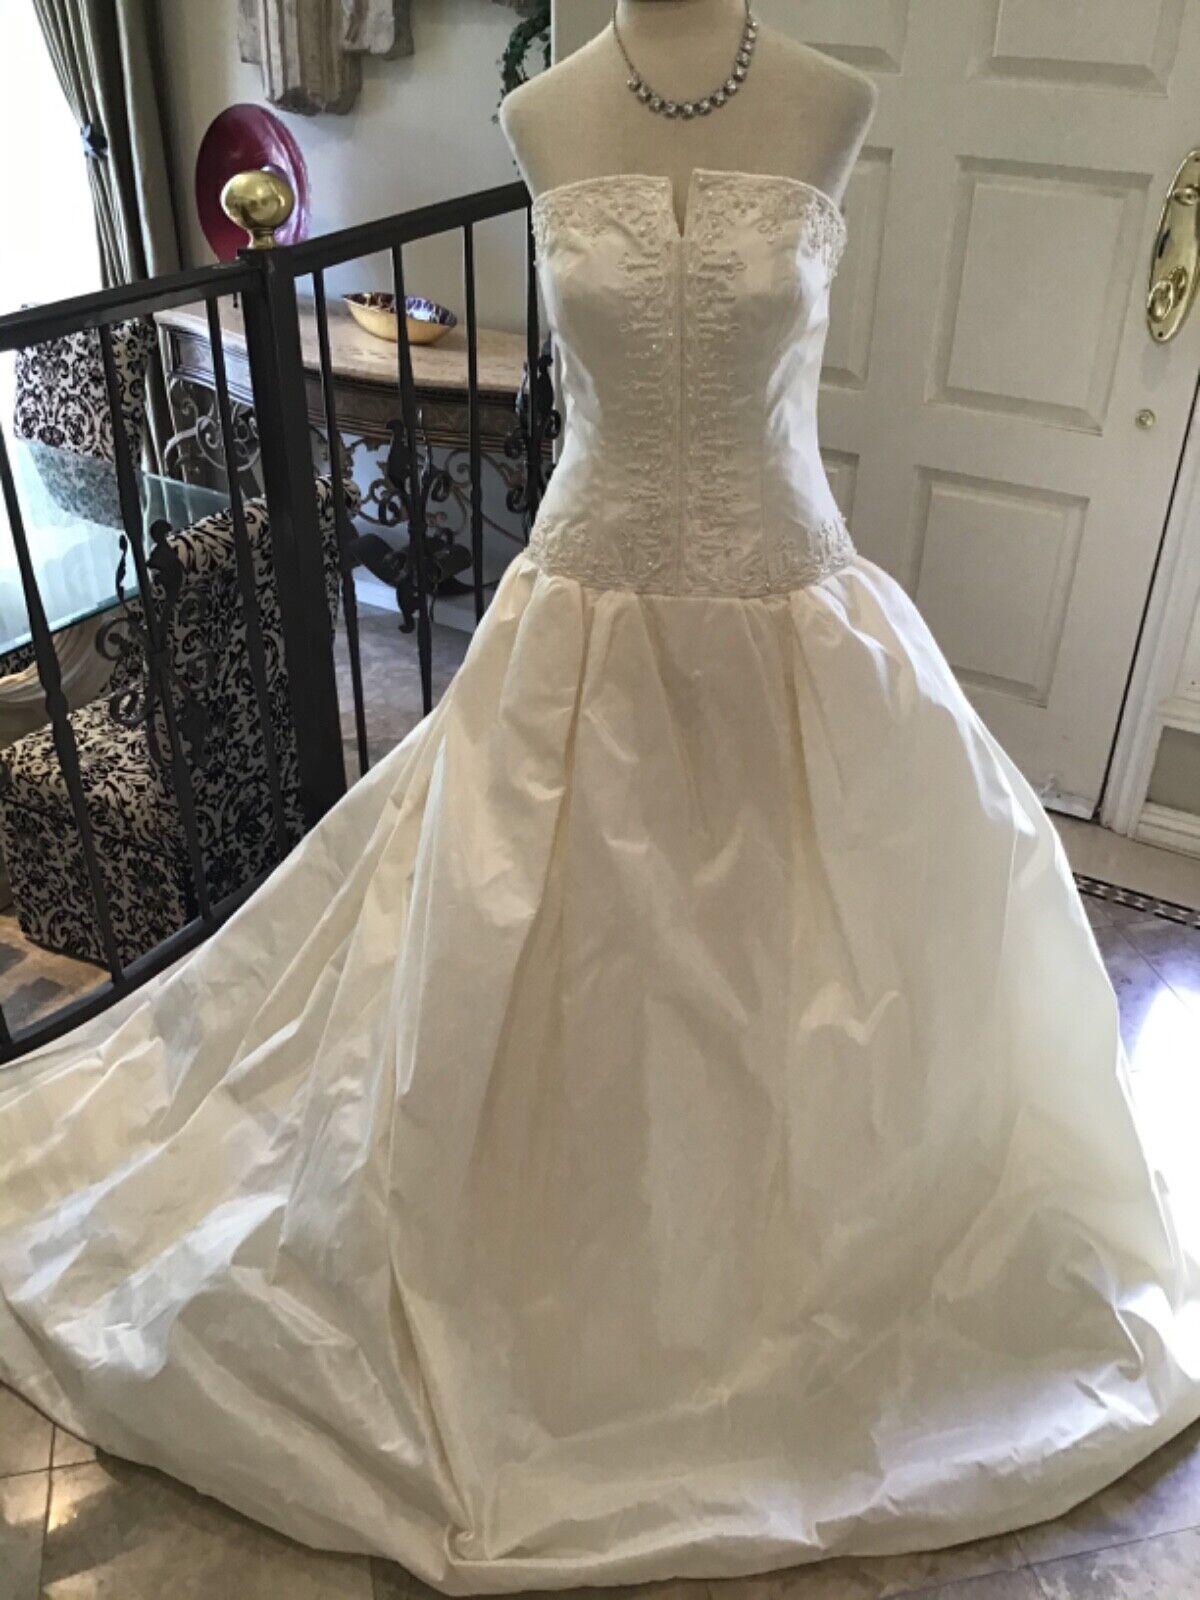 PRONOVIAS NEW Bridal Ball gown Wedding Dress BIBIANA Strapless Ivory SILK 12